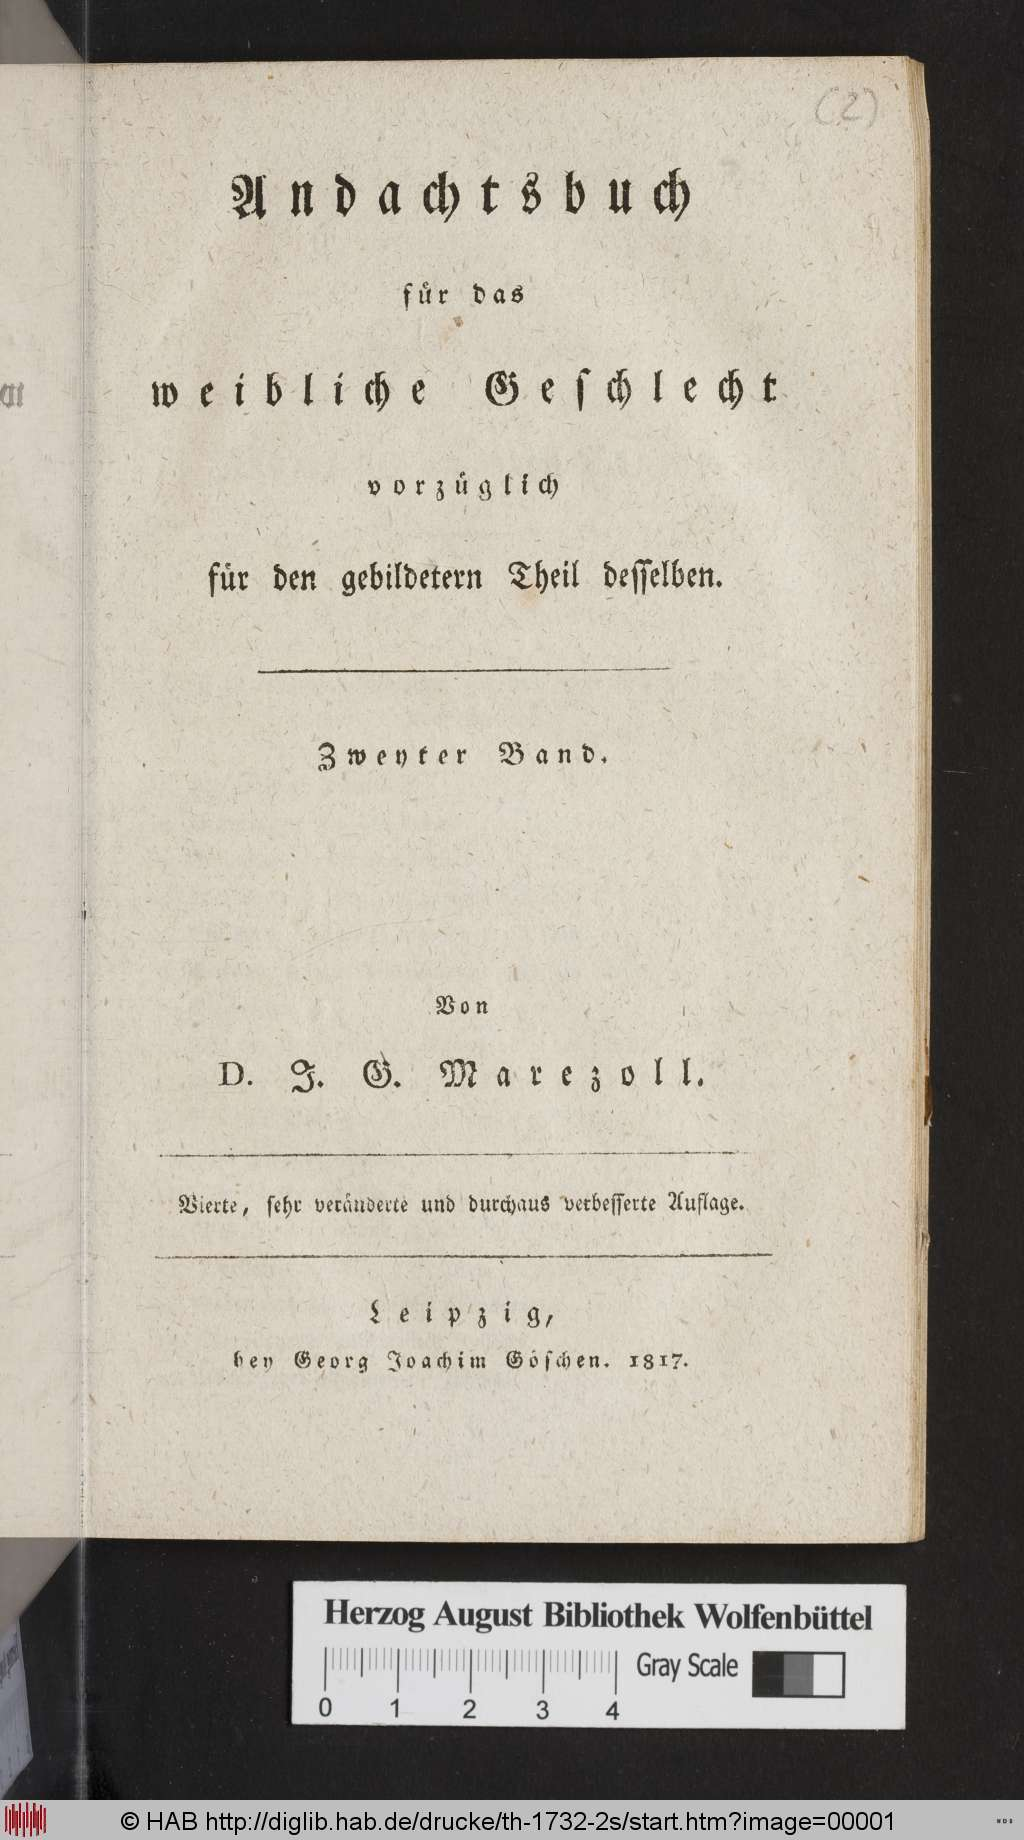 http://diglib.hab.de/drucke/th-1732-2s/00001.jpg